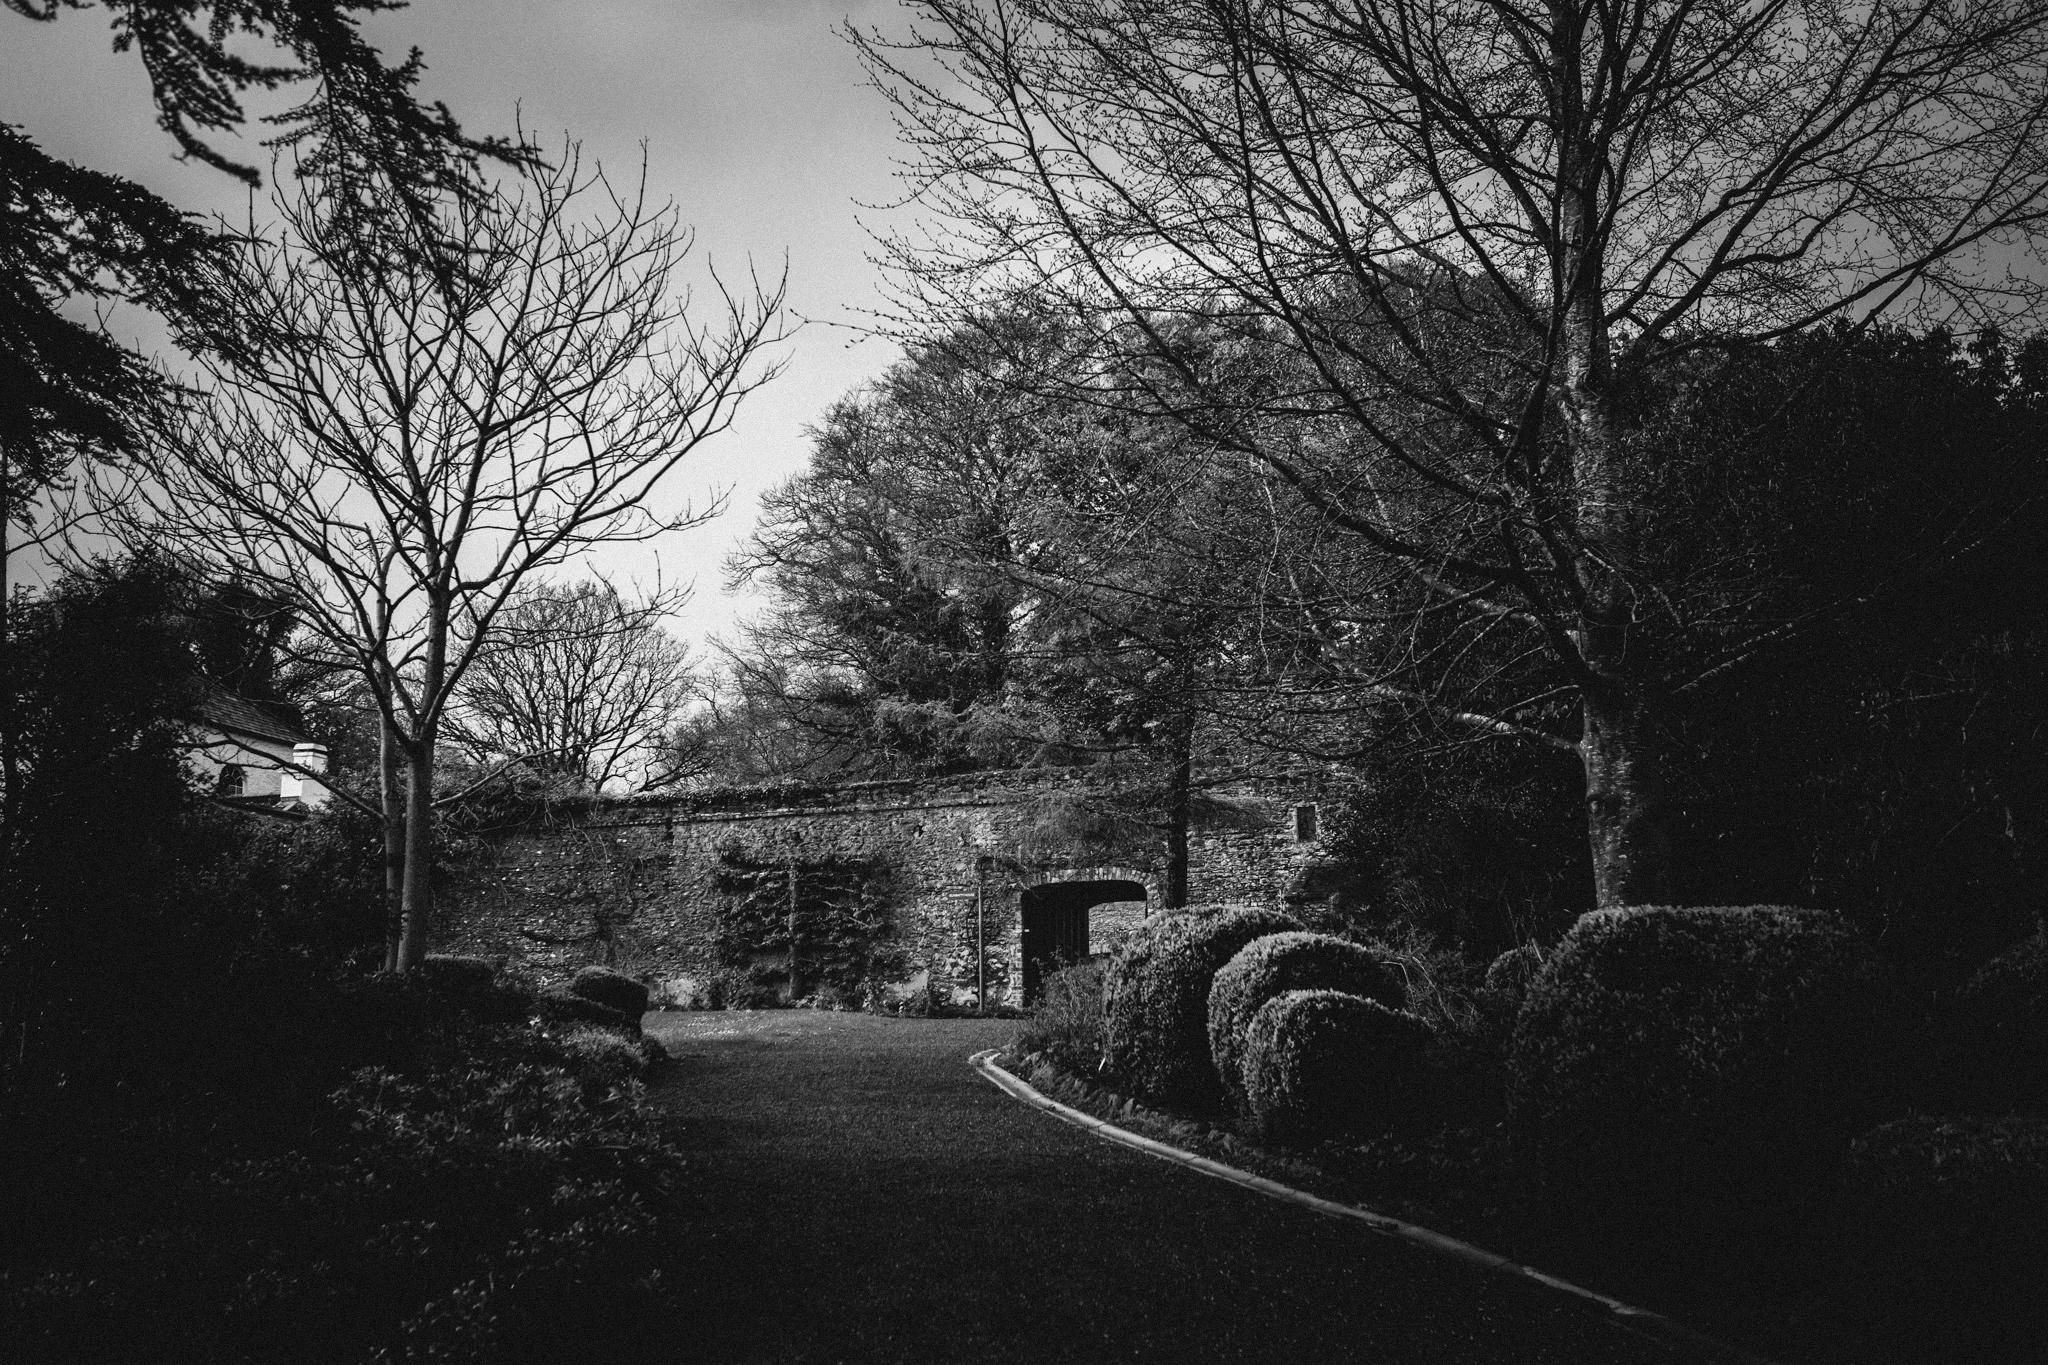 ireland_galway_dublin_rebecca_burt_photography-95.jpg